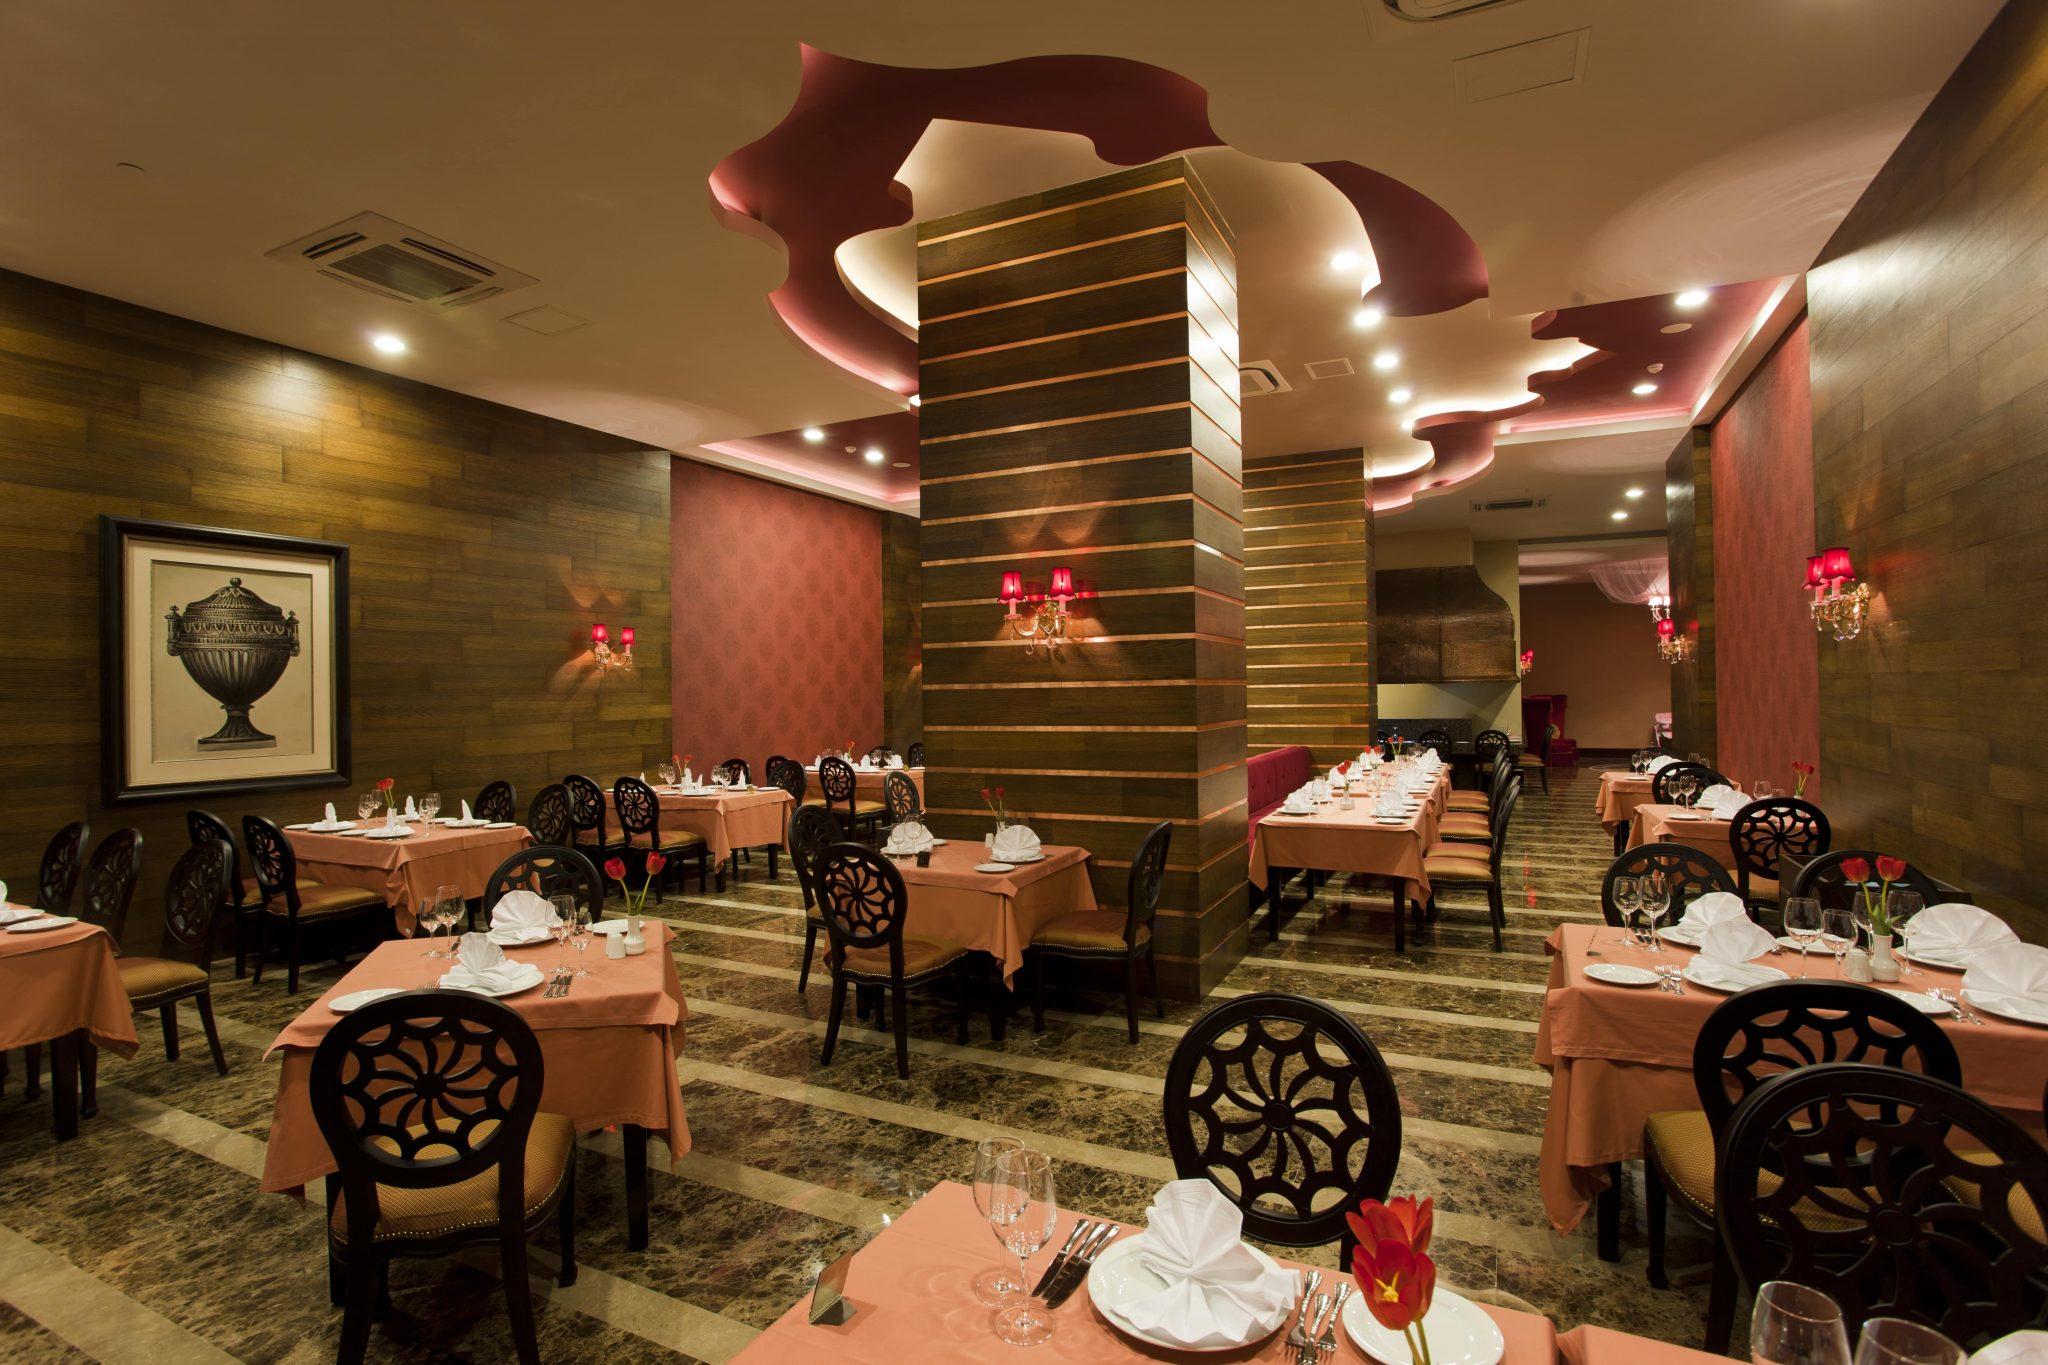 Letovanje_Turska_Hoteli_Avio_Antalija_Hotel_Royal_Holiday_Palace-26-scaled.jpg